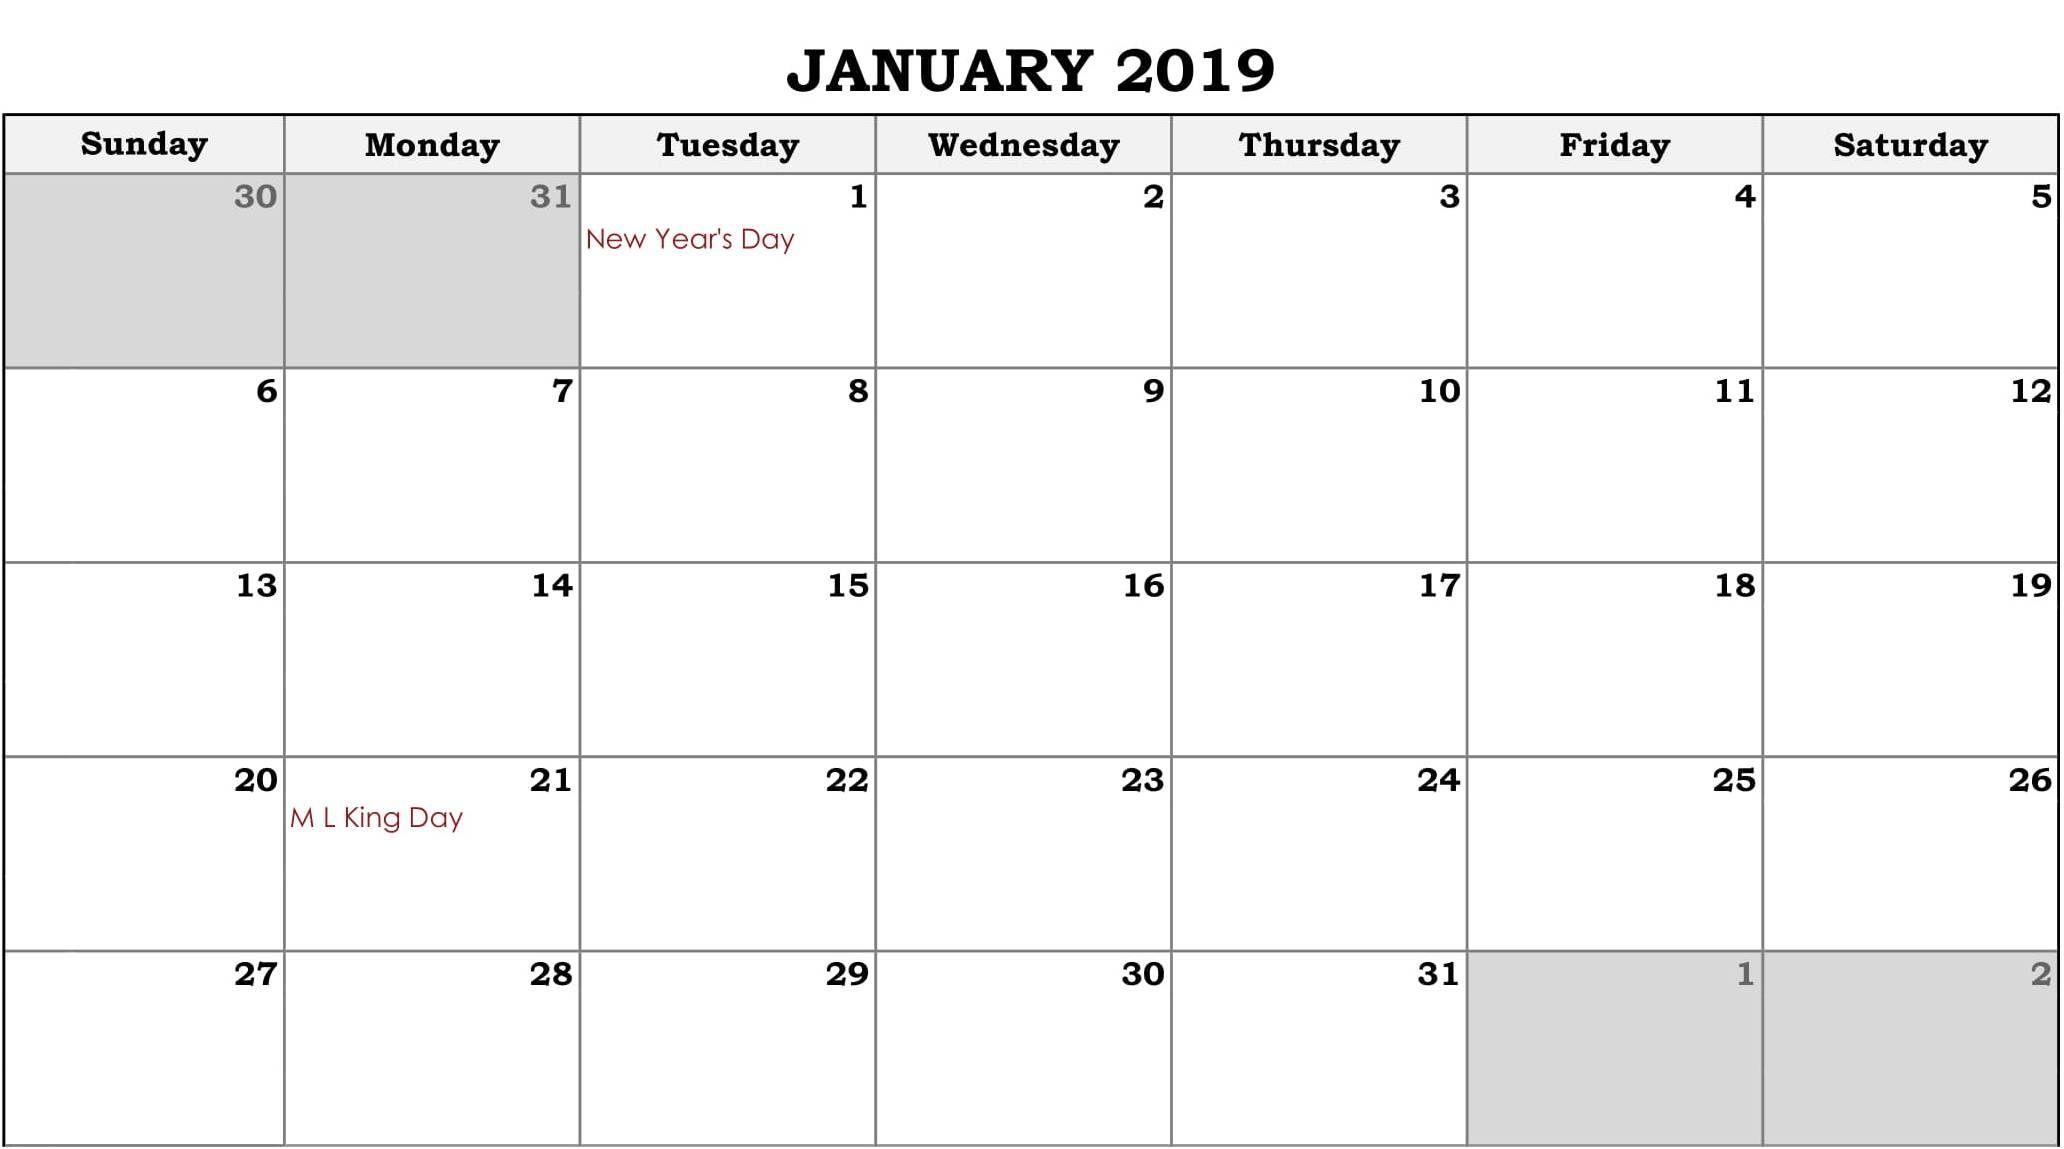 Online Editable Calendar 2019 Online Fillable Calendar January 2019 | 250+ January 2019 Calendar